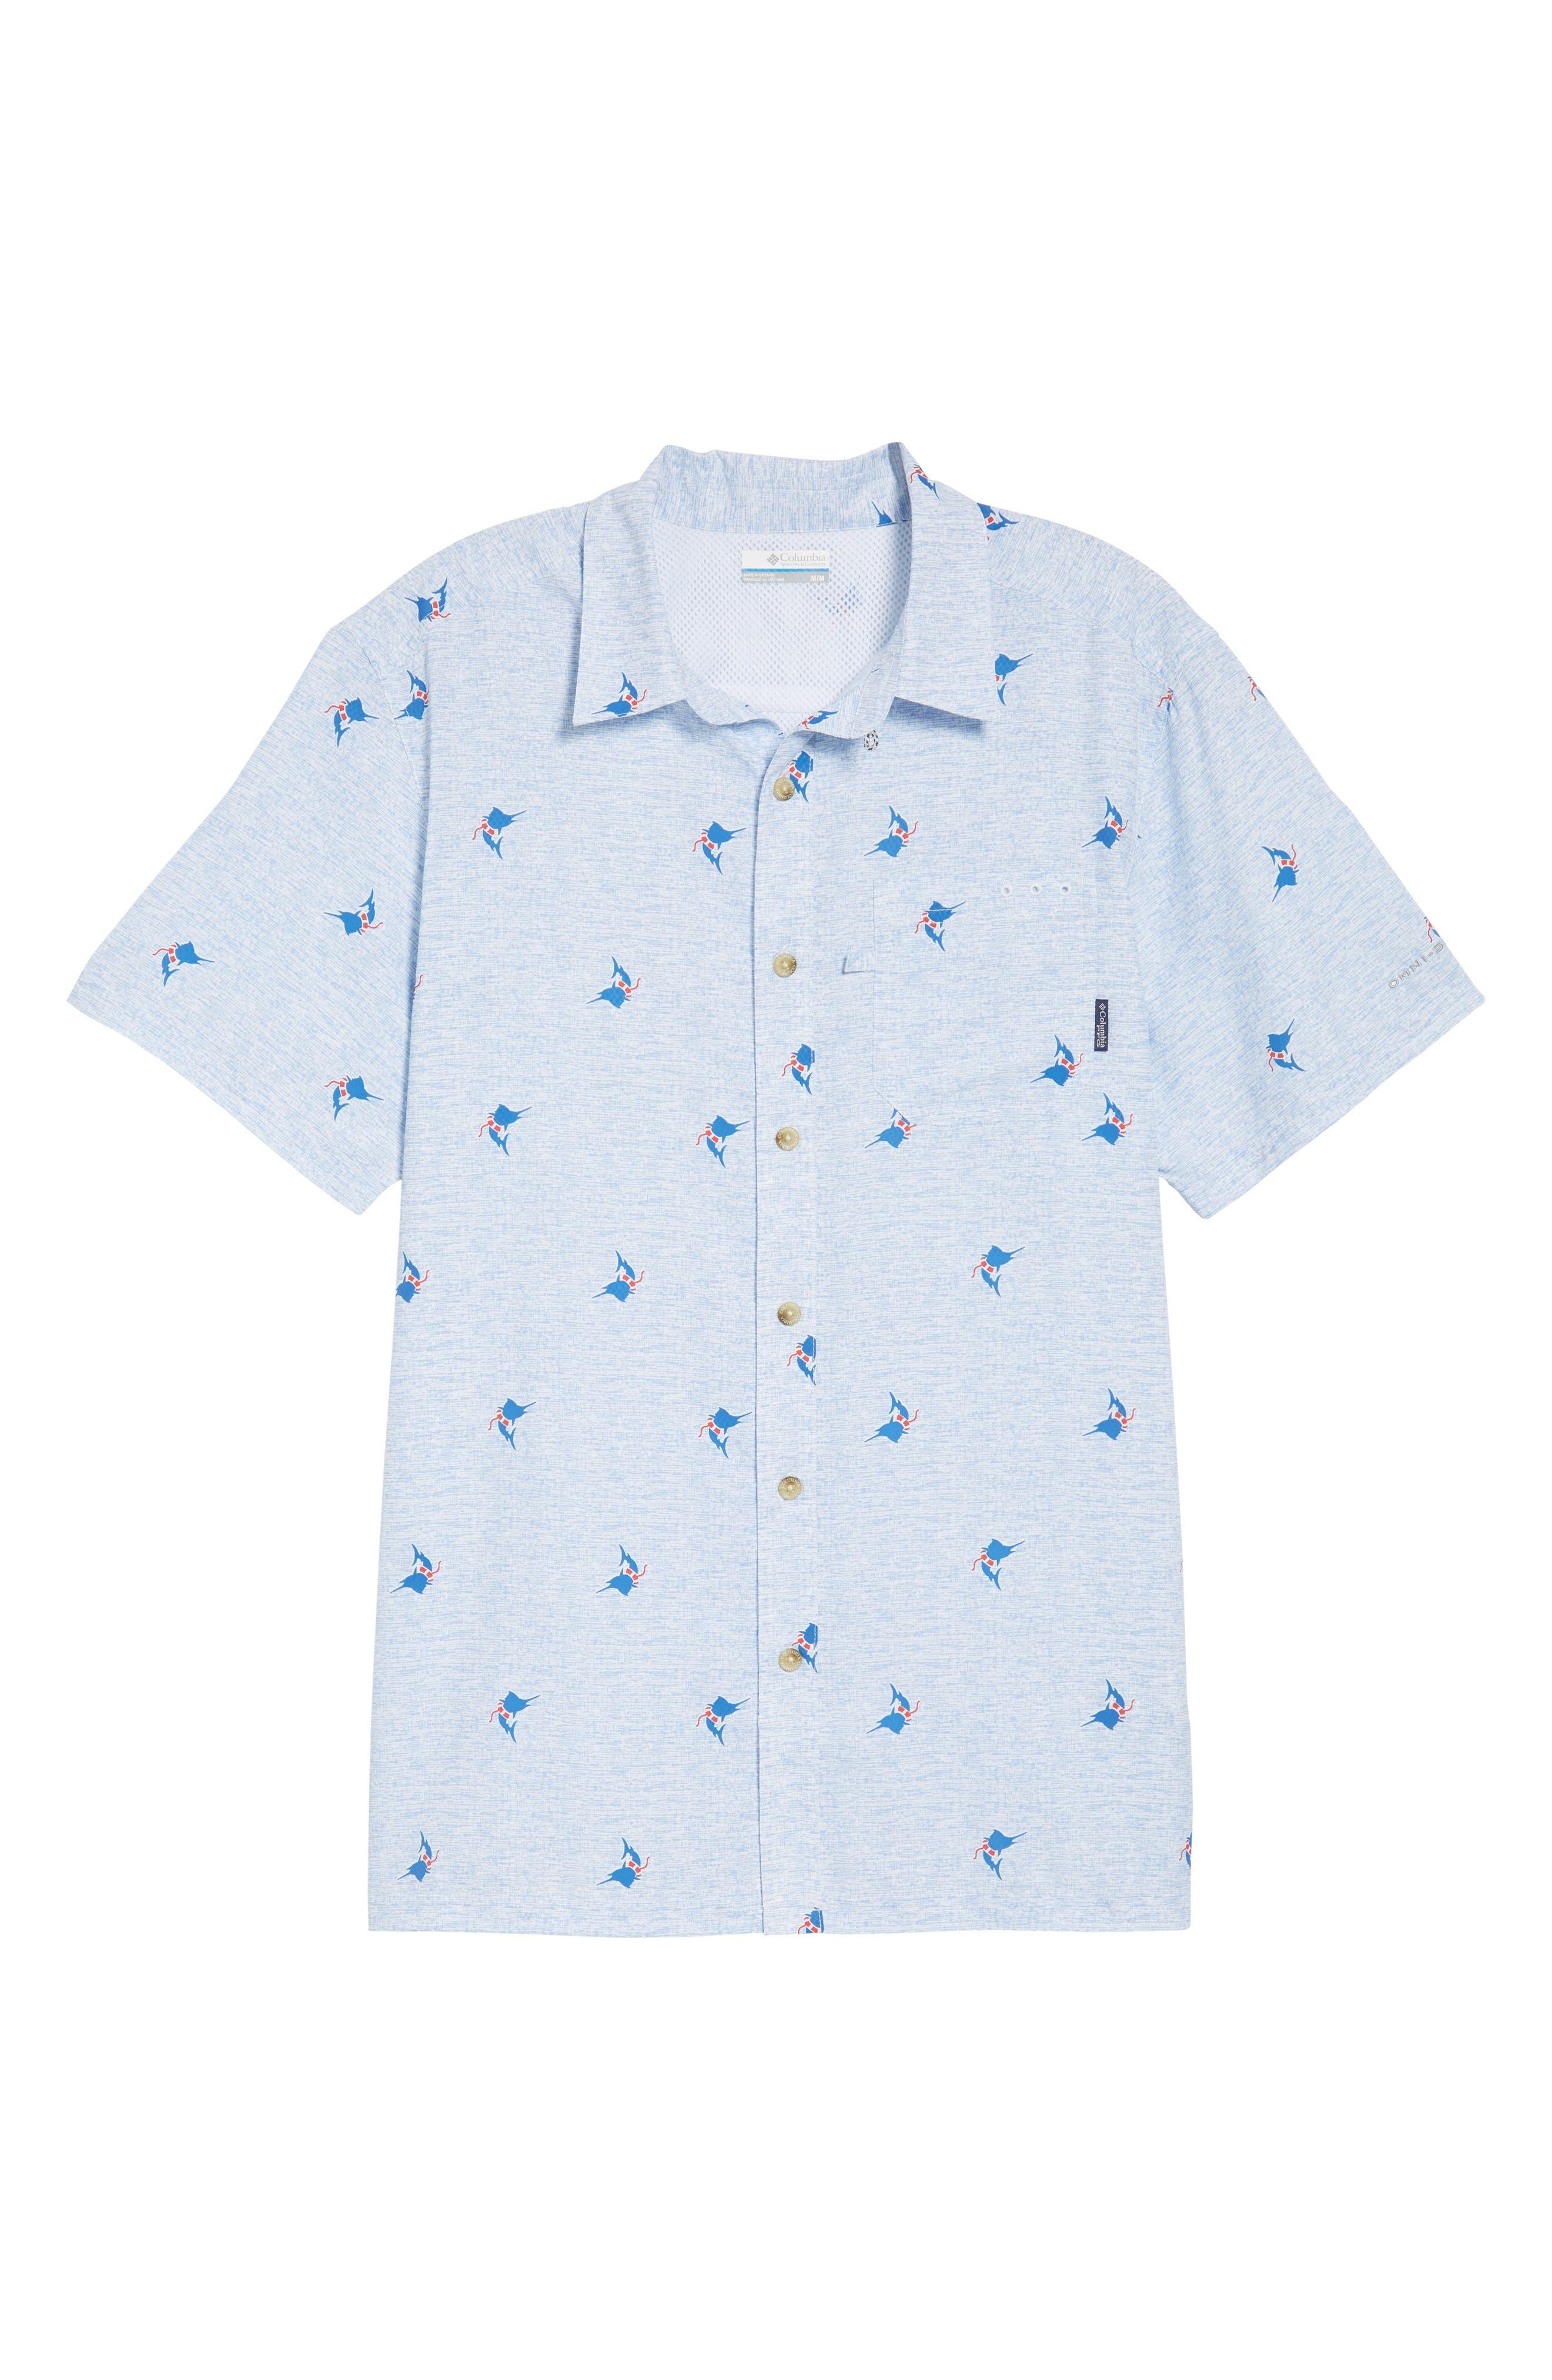 Super Slack Tide Patterned Woven Shirt,                             Alternate thumbnail 29, color,